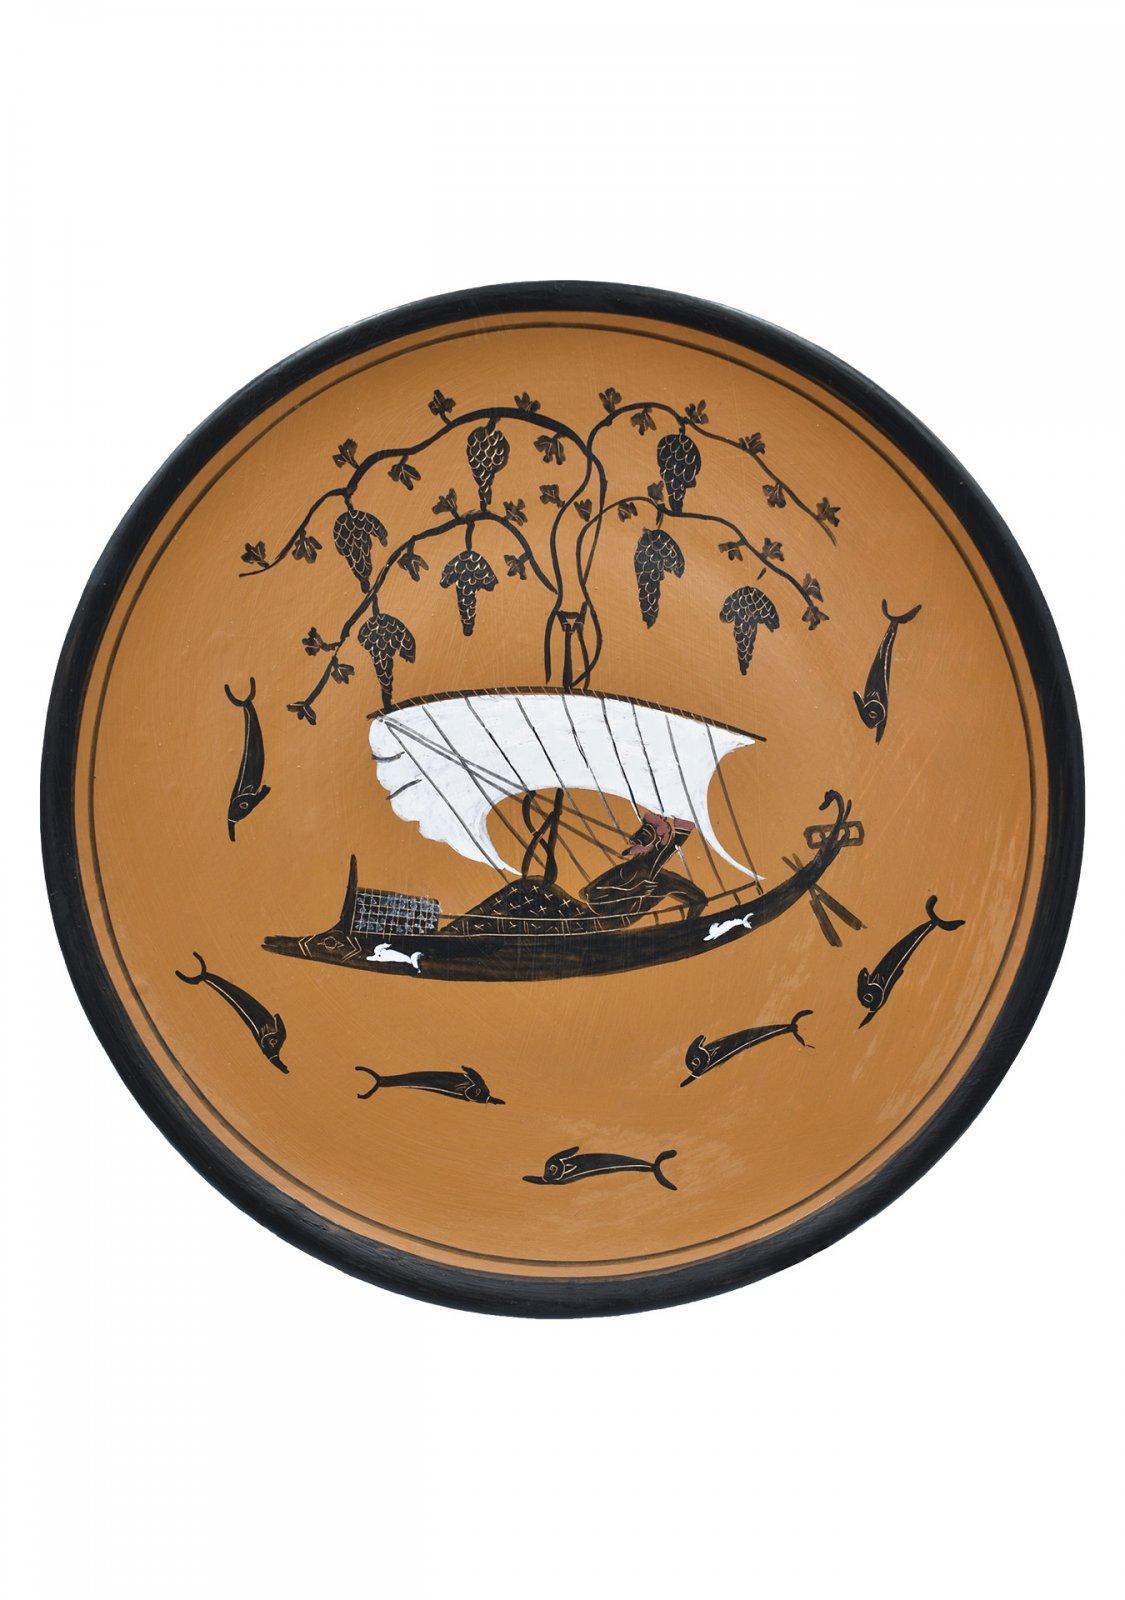 Greek Attic black-figure ceramic plate depicting God Dionysus in a ship (20cm)